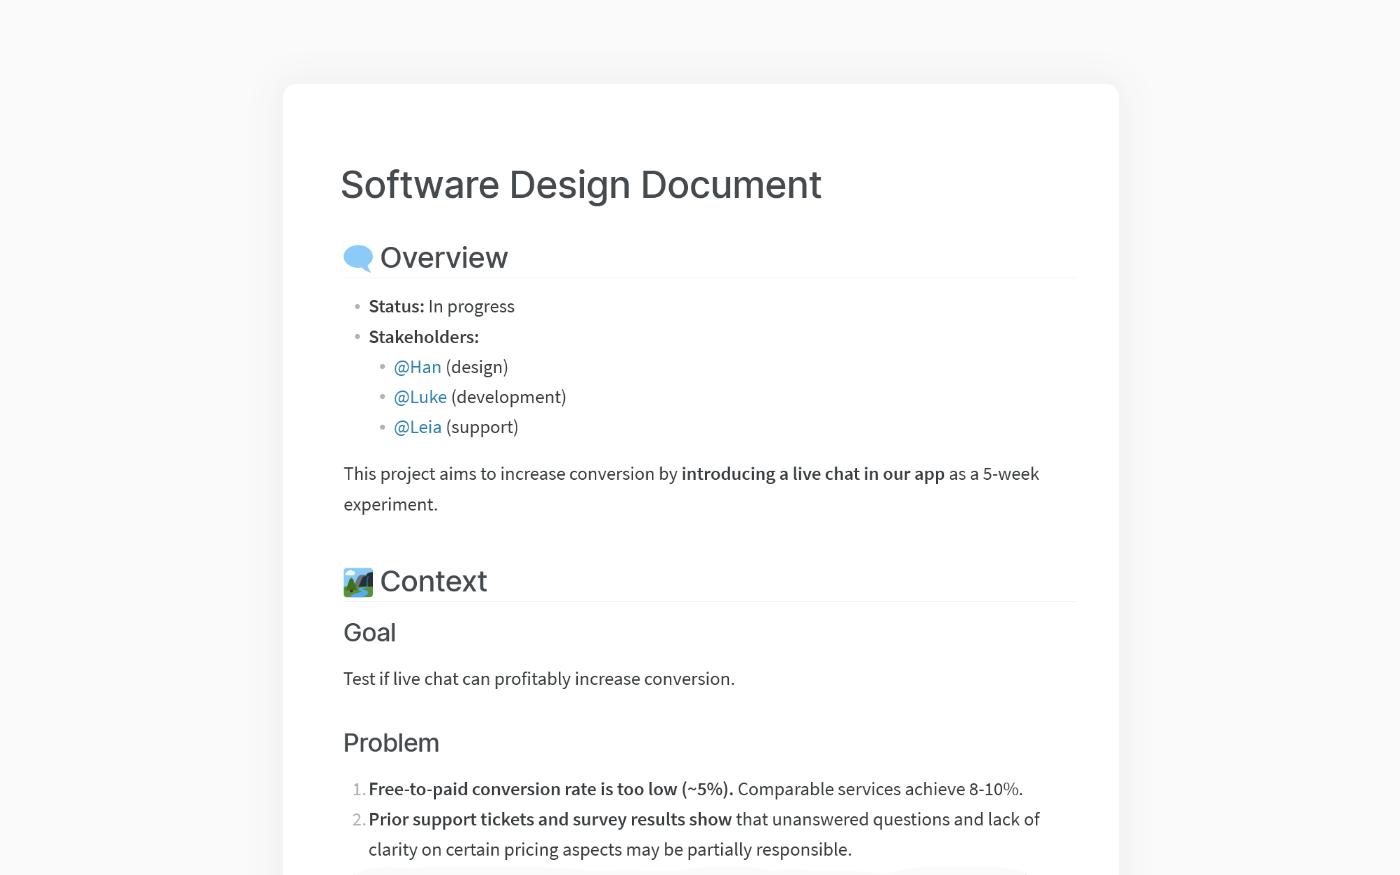 SDD template